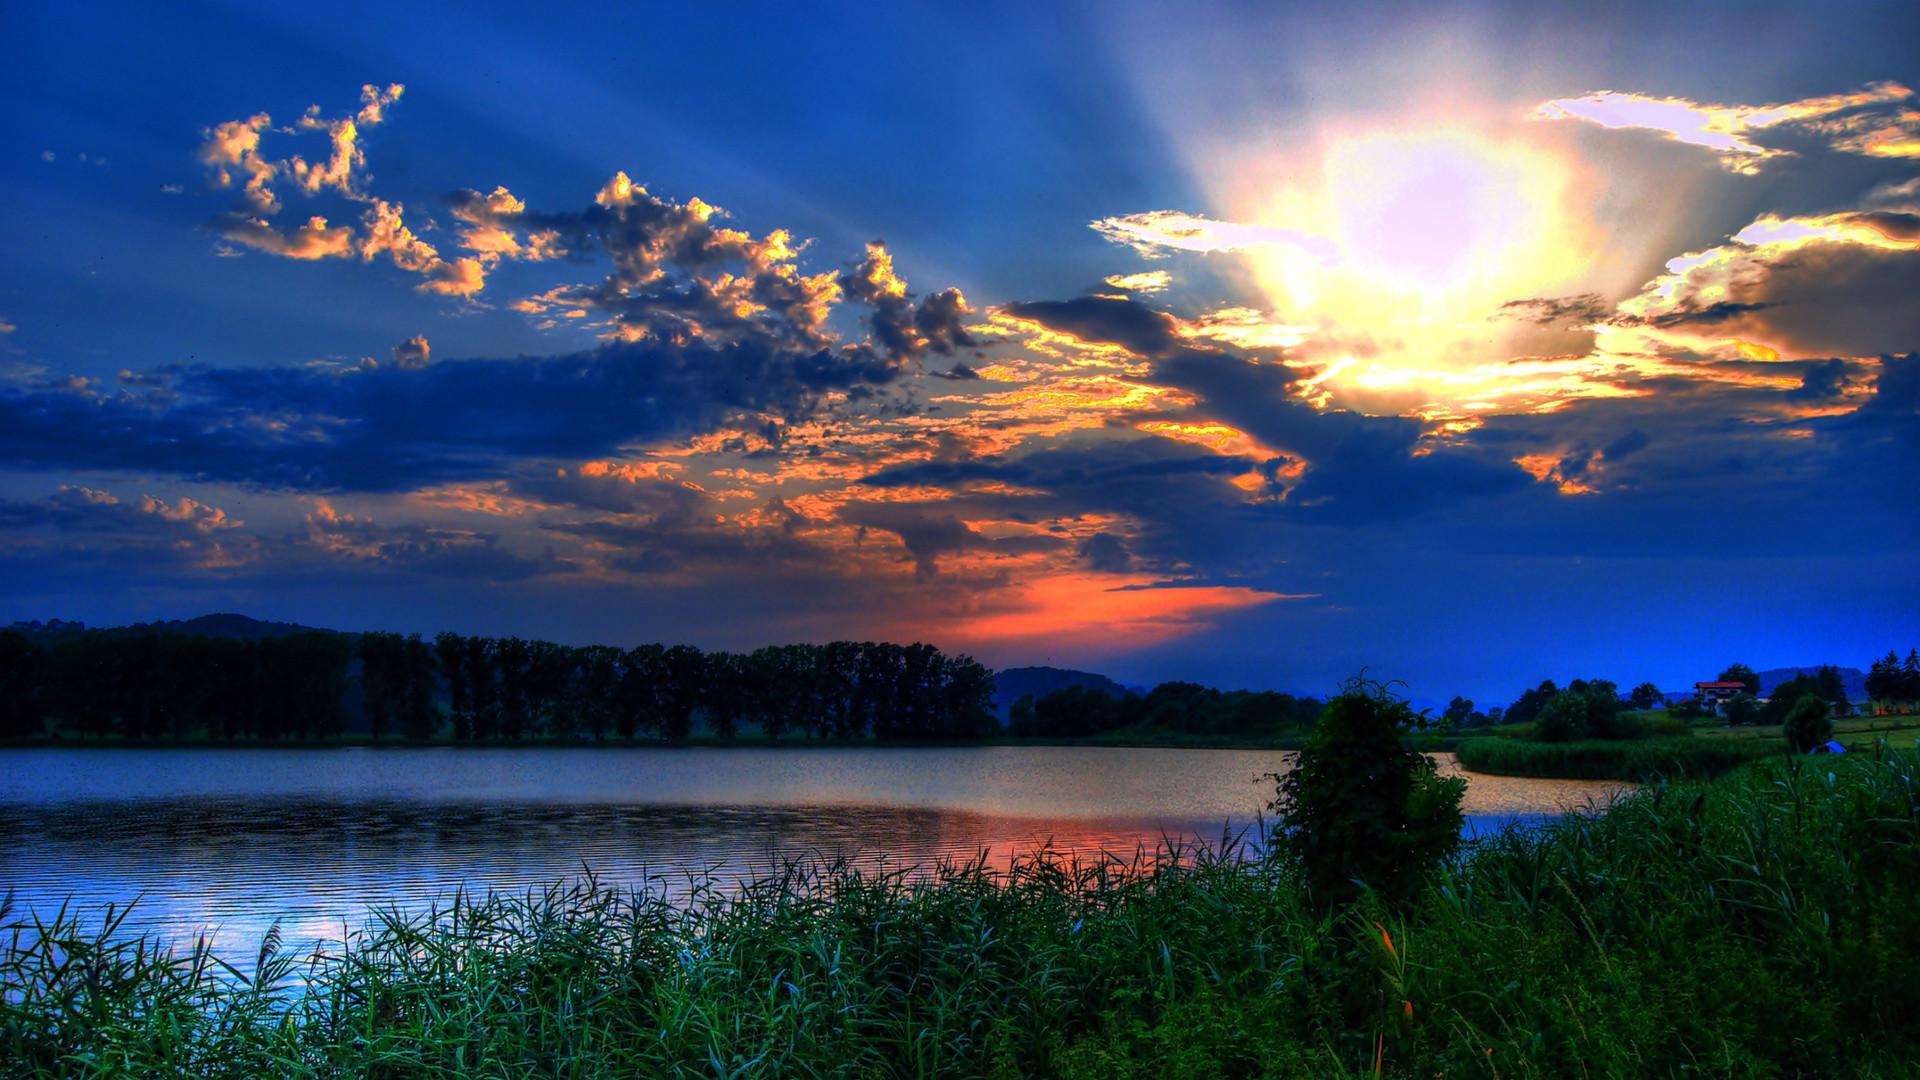 Res: 1920x1080, Gorgeous, Sunset, Behind, Dark, Clouds, Wide, Hd, Wallpaper, Download,  Free, Desktop, Background, Photos, Desktop Images, Download, Free, ...